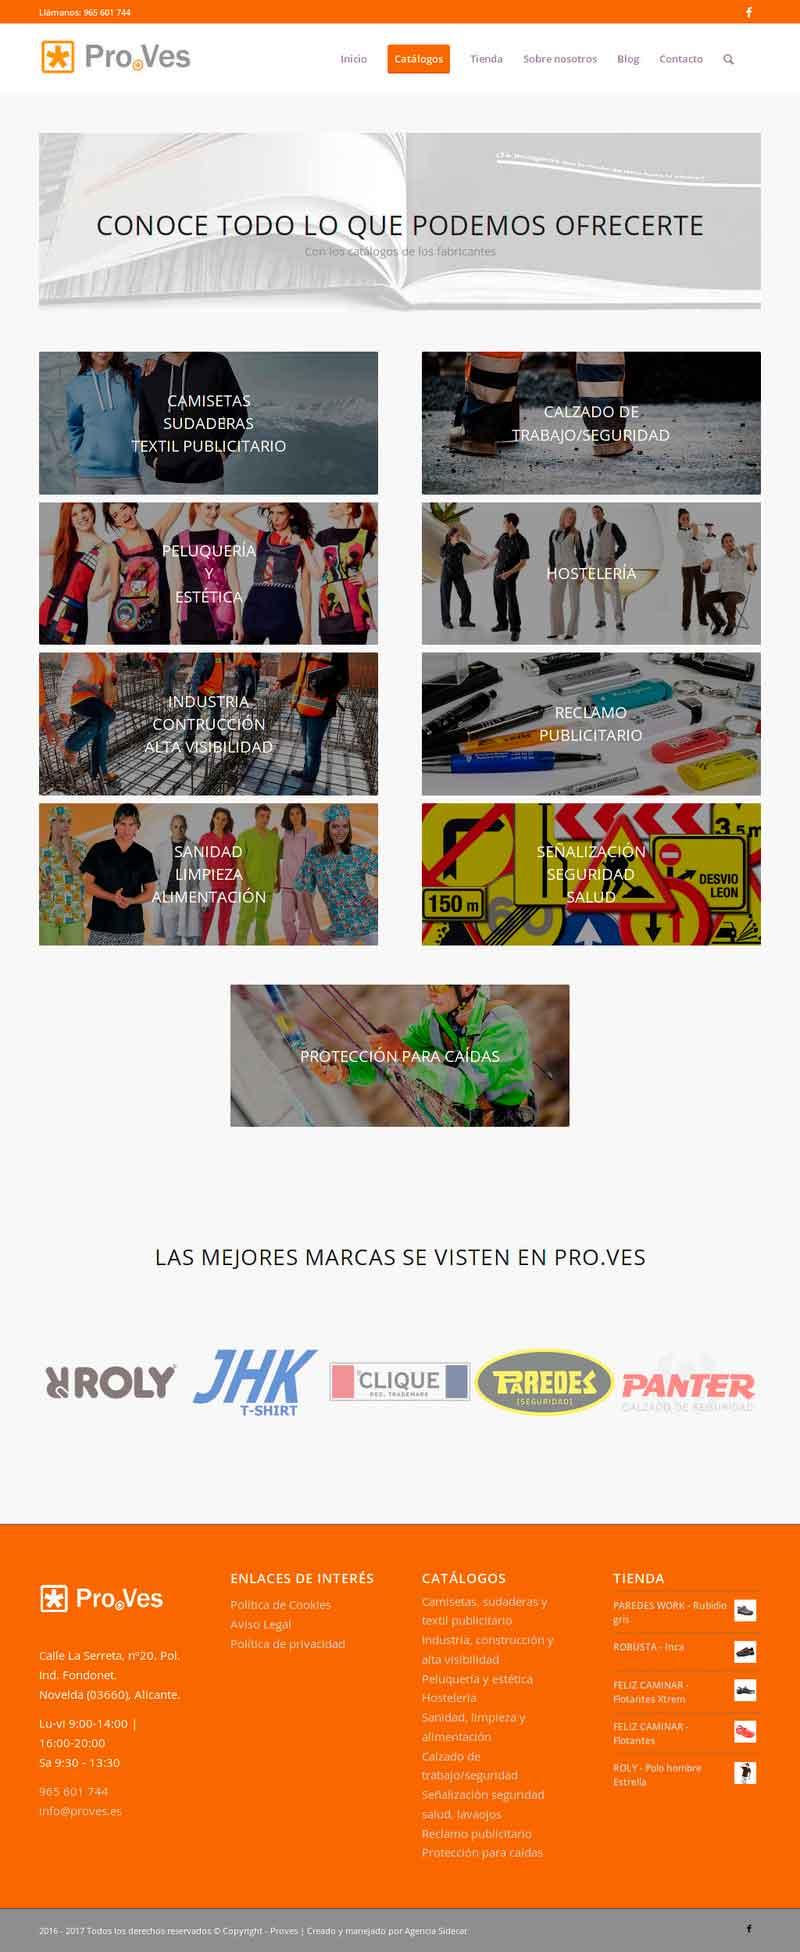 Agencia Sidecar agencia-sidecar-portfolio-proves-2 Pro.Ves